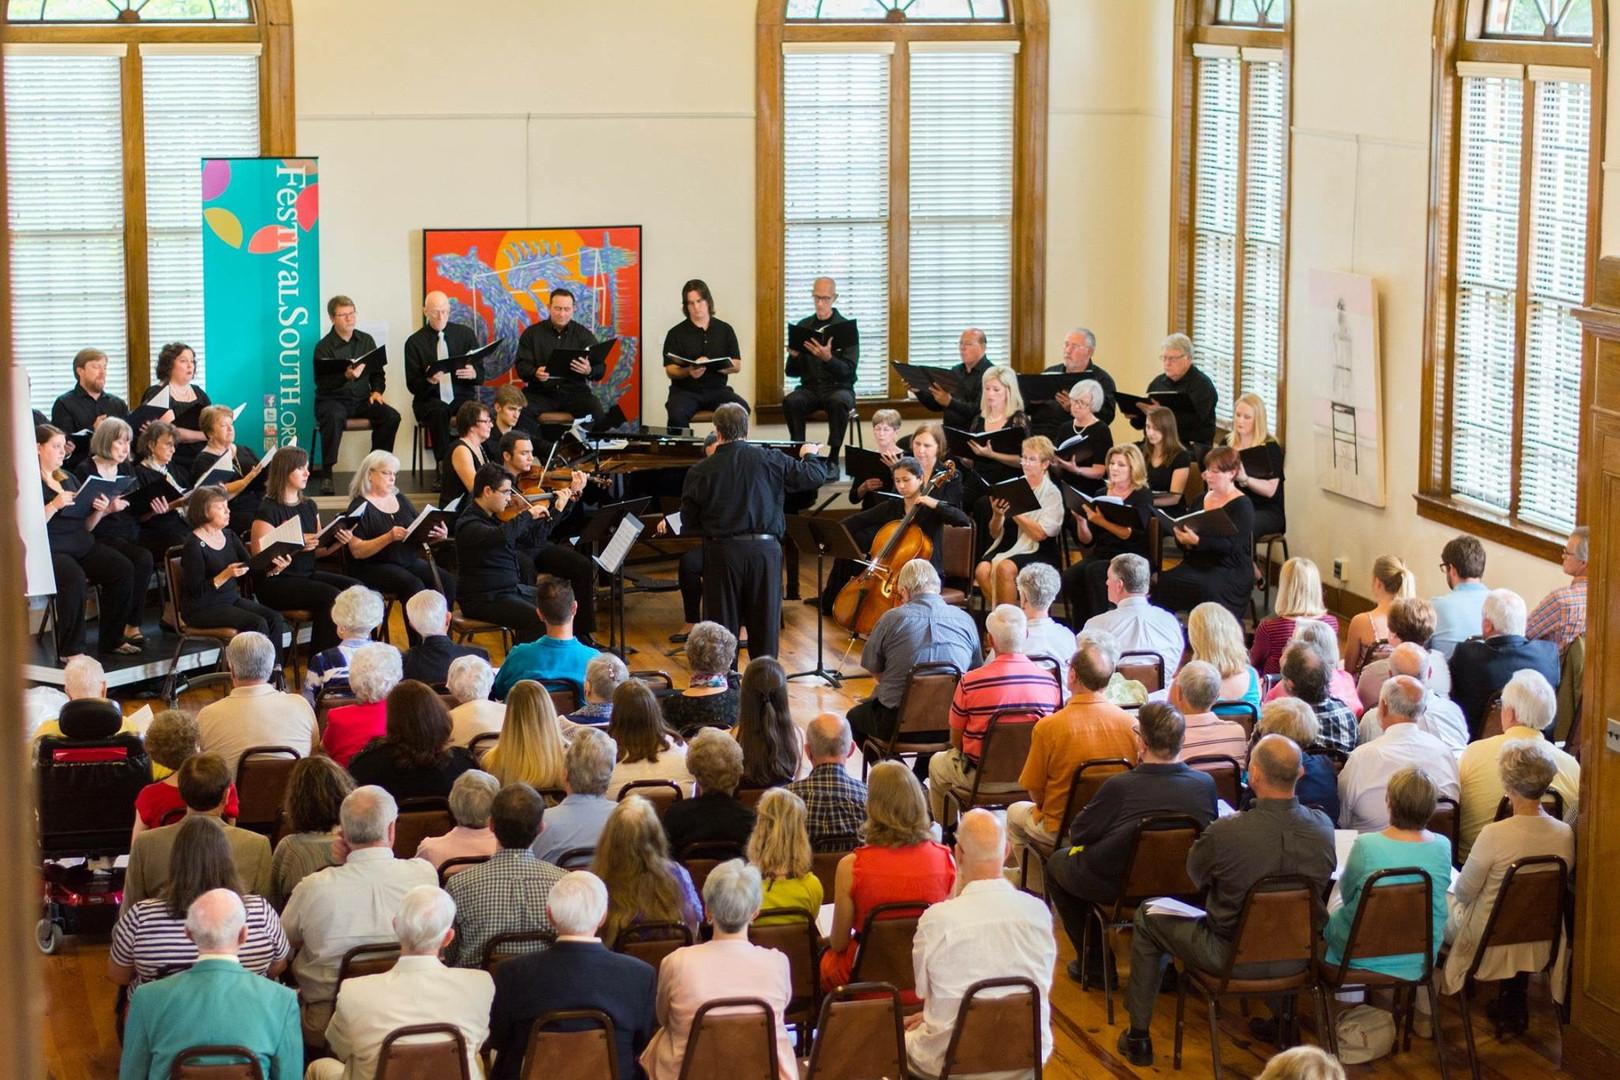 Meistersingers in performance